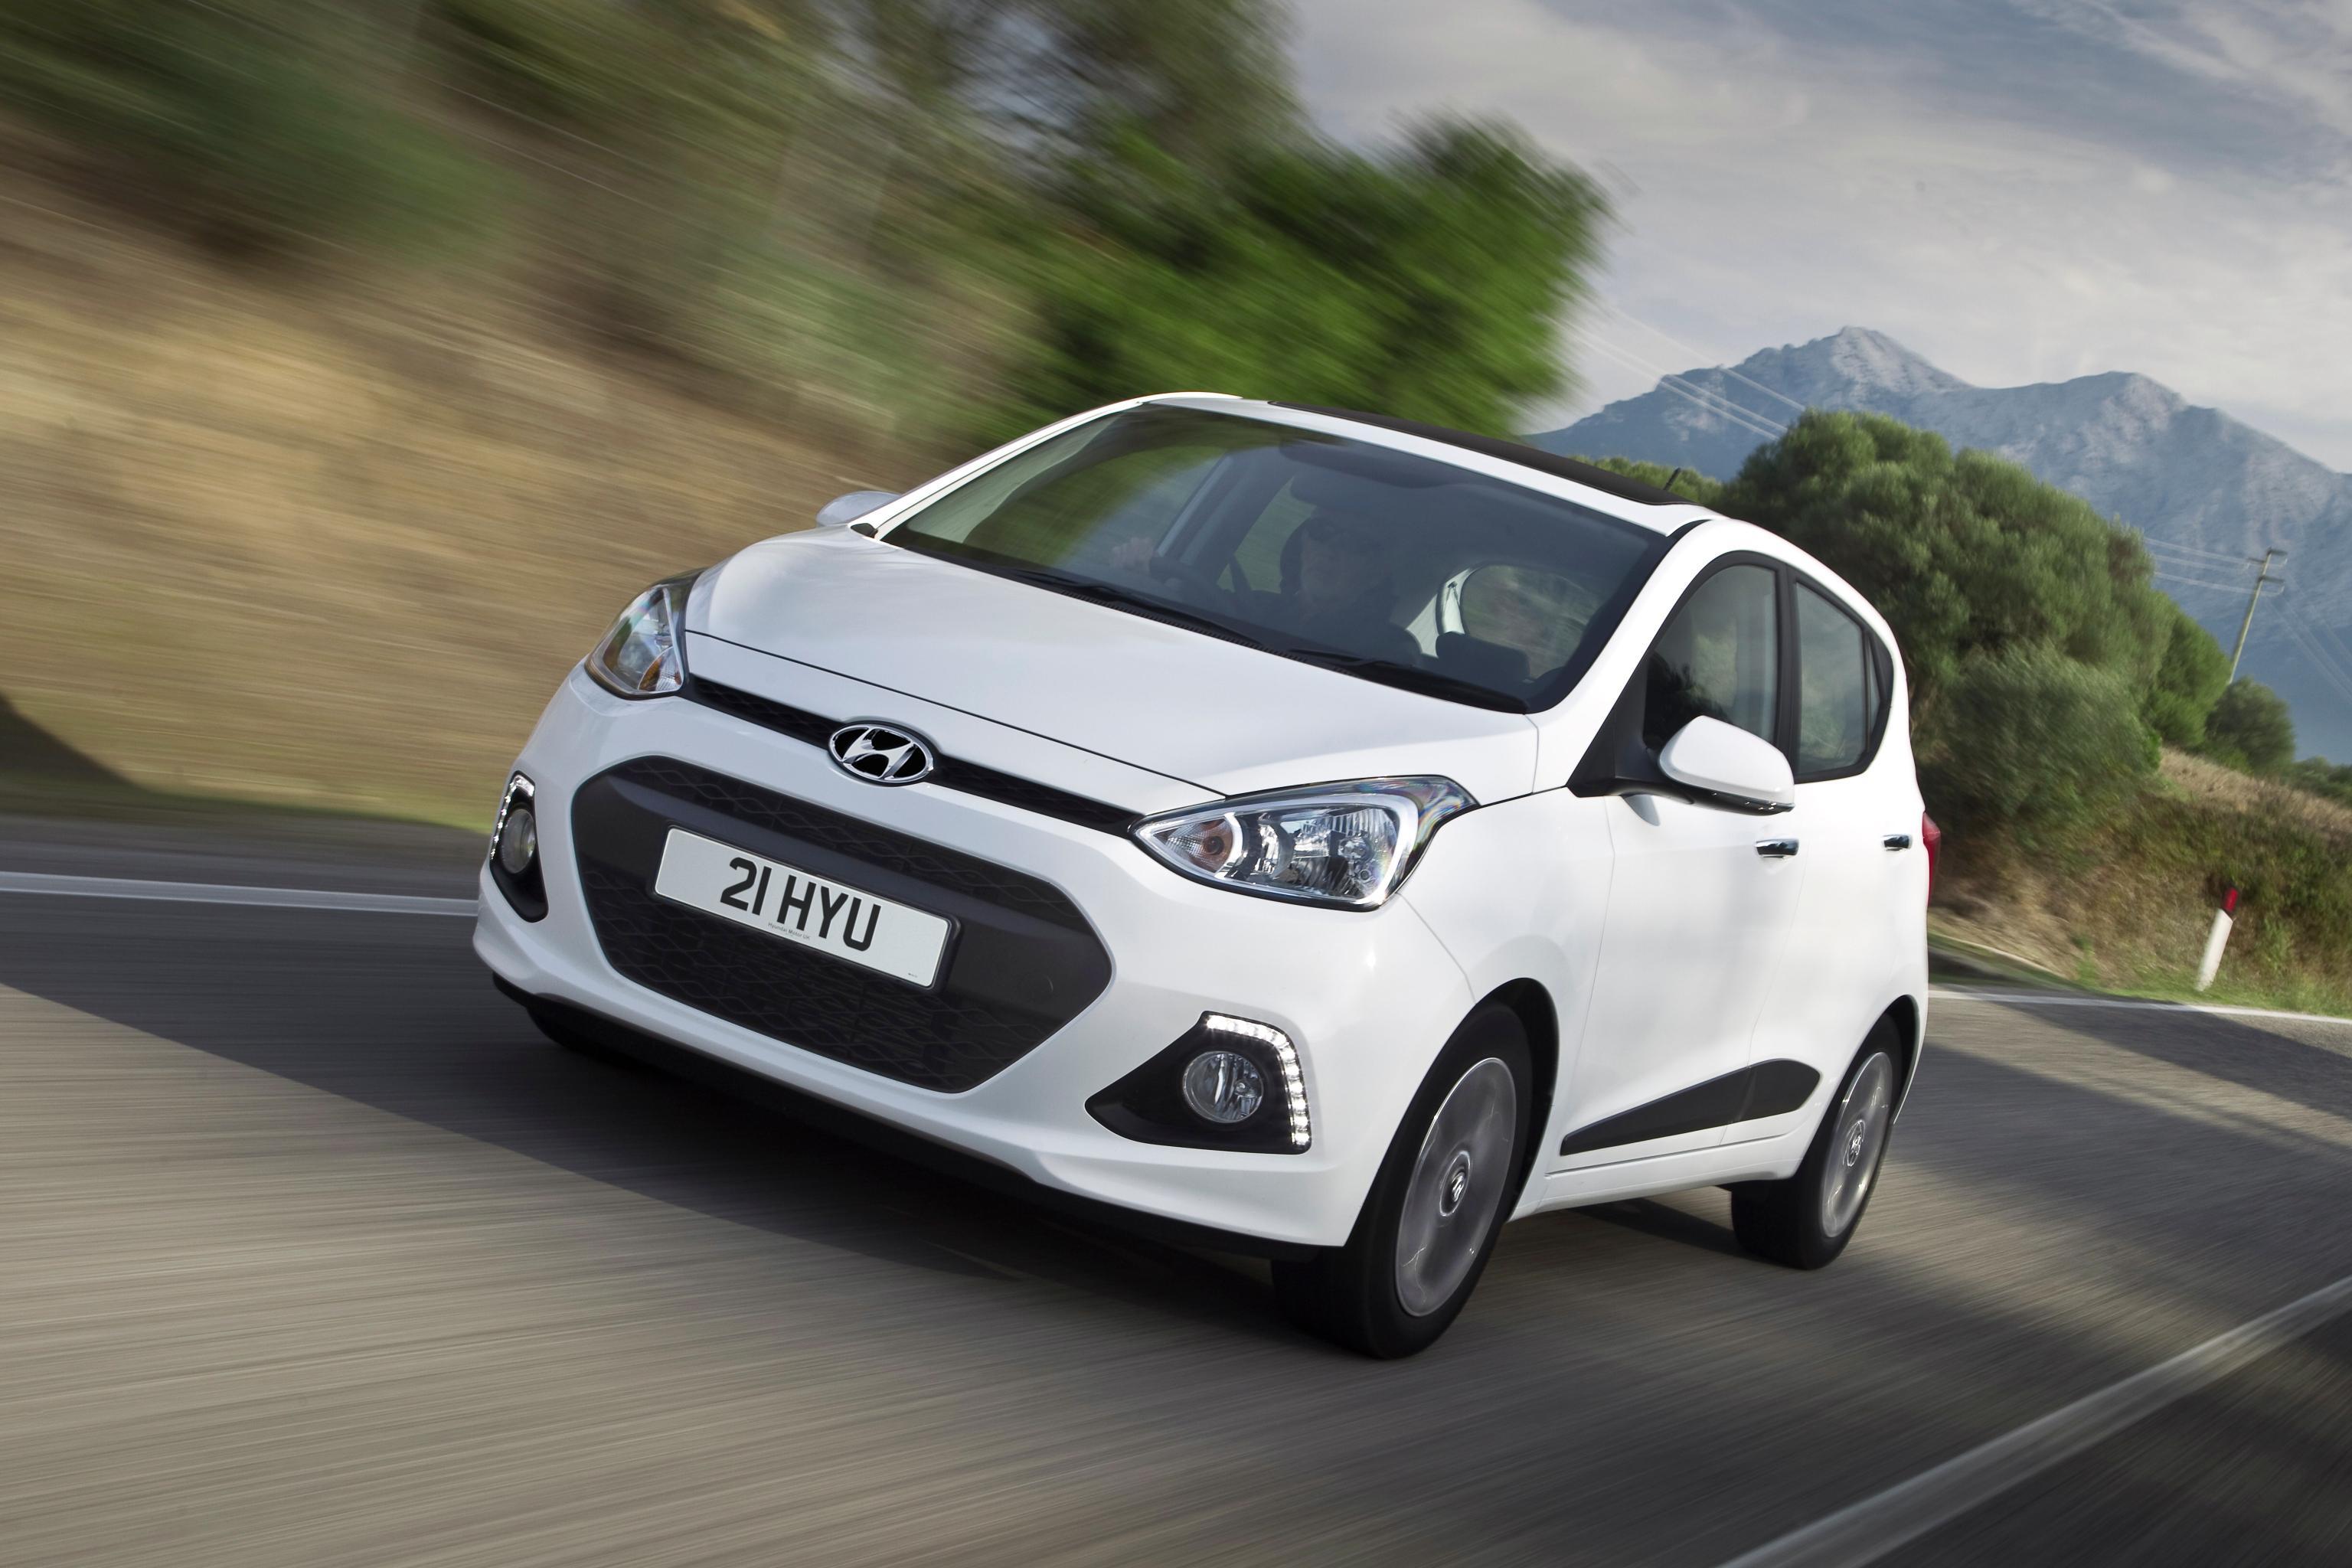 Hyundai Santa Fe Grand 2018 >> 2015 Hyundai i10 Adds Premium SE Trim Level in the UK - autoevolution